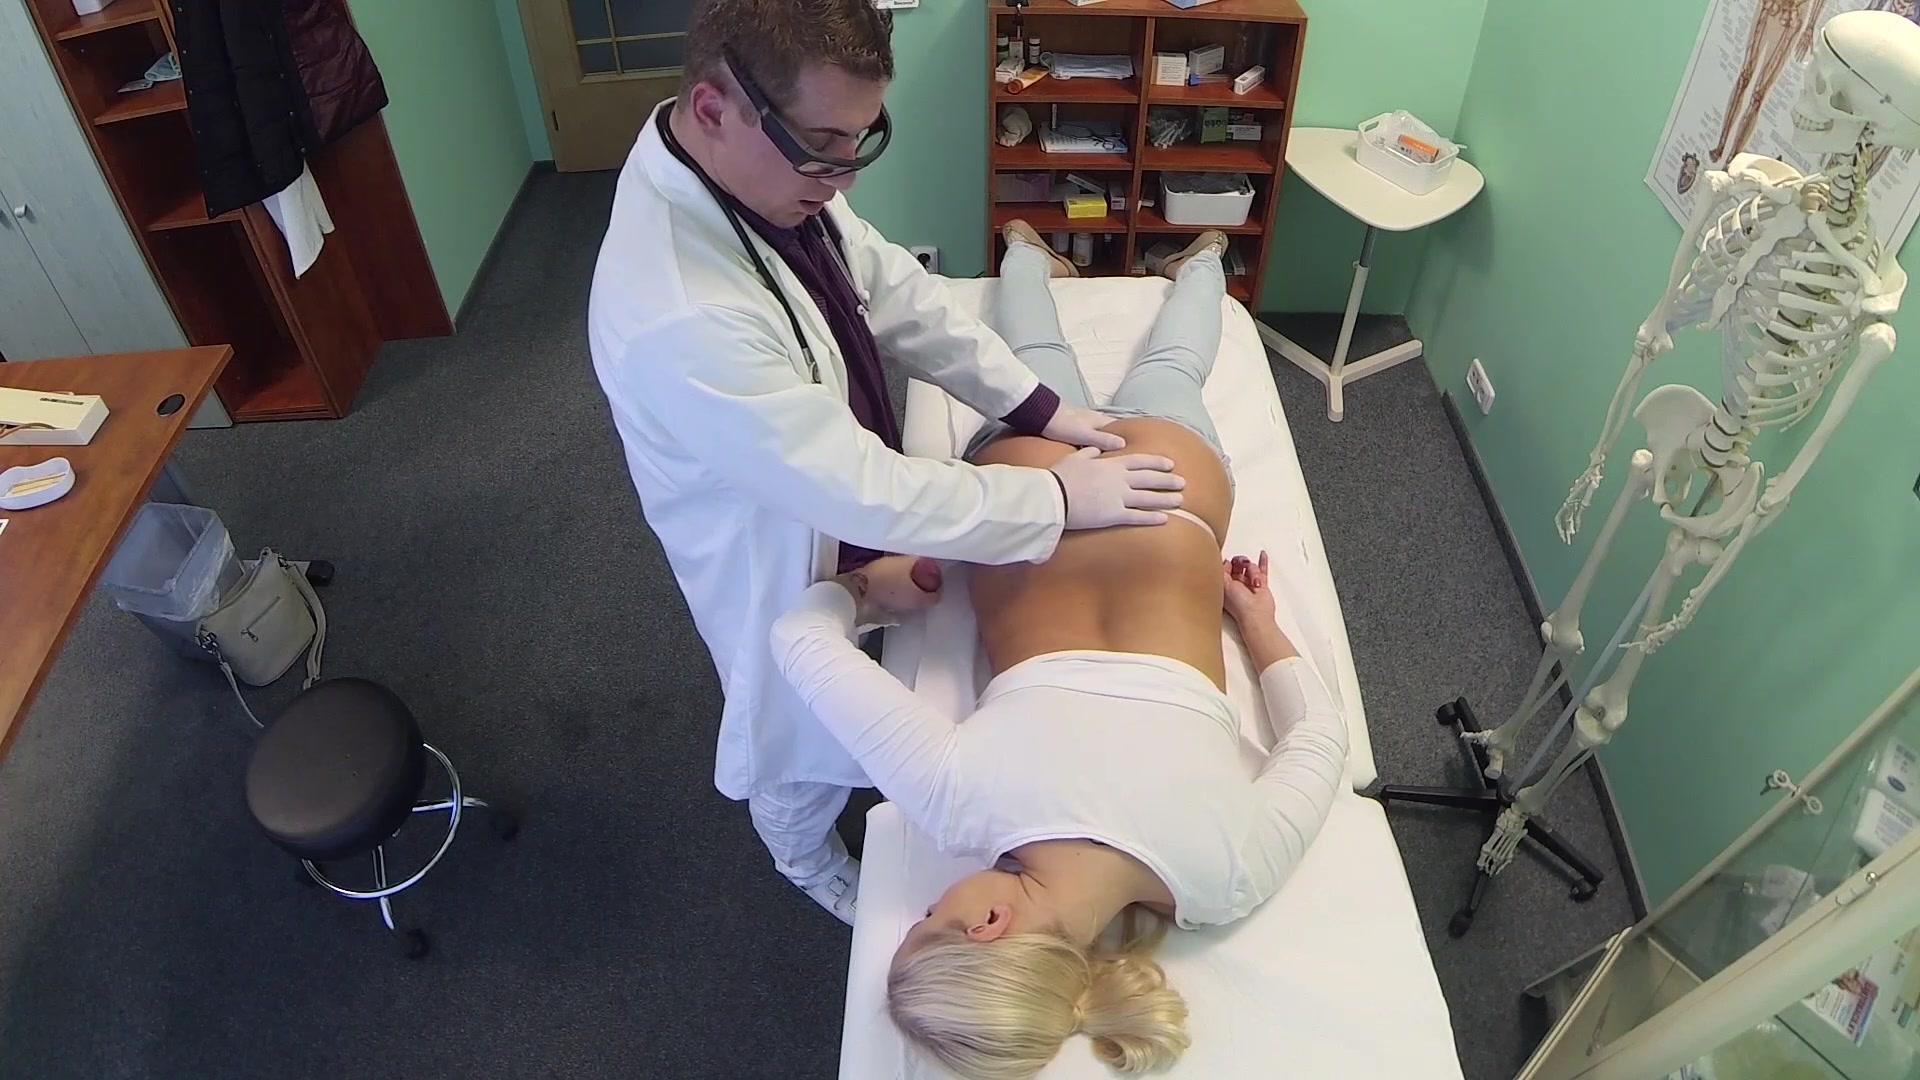 Секс Госпиталь Смотреть Онлайн На Tlc